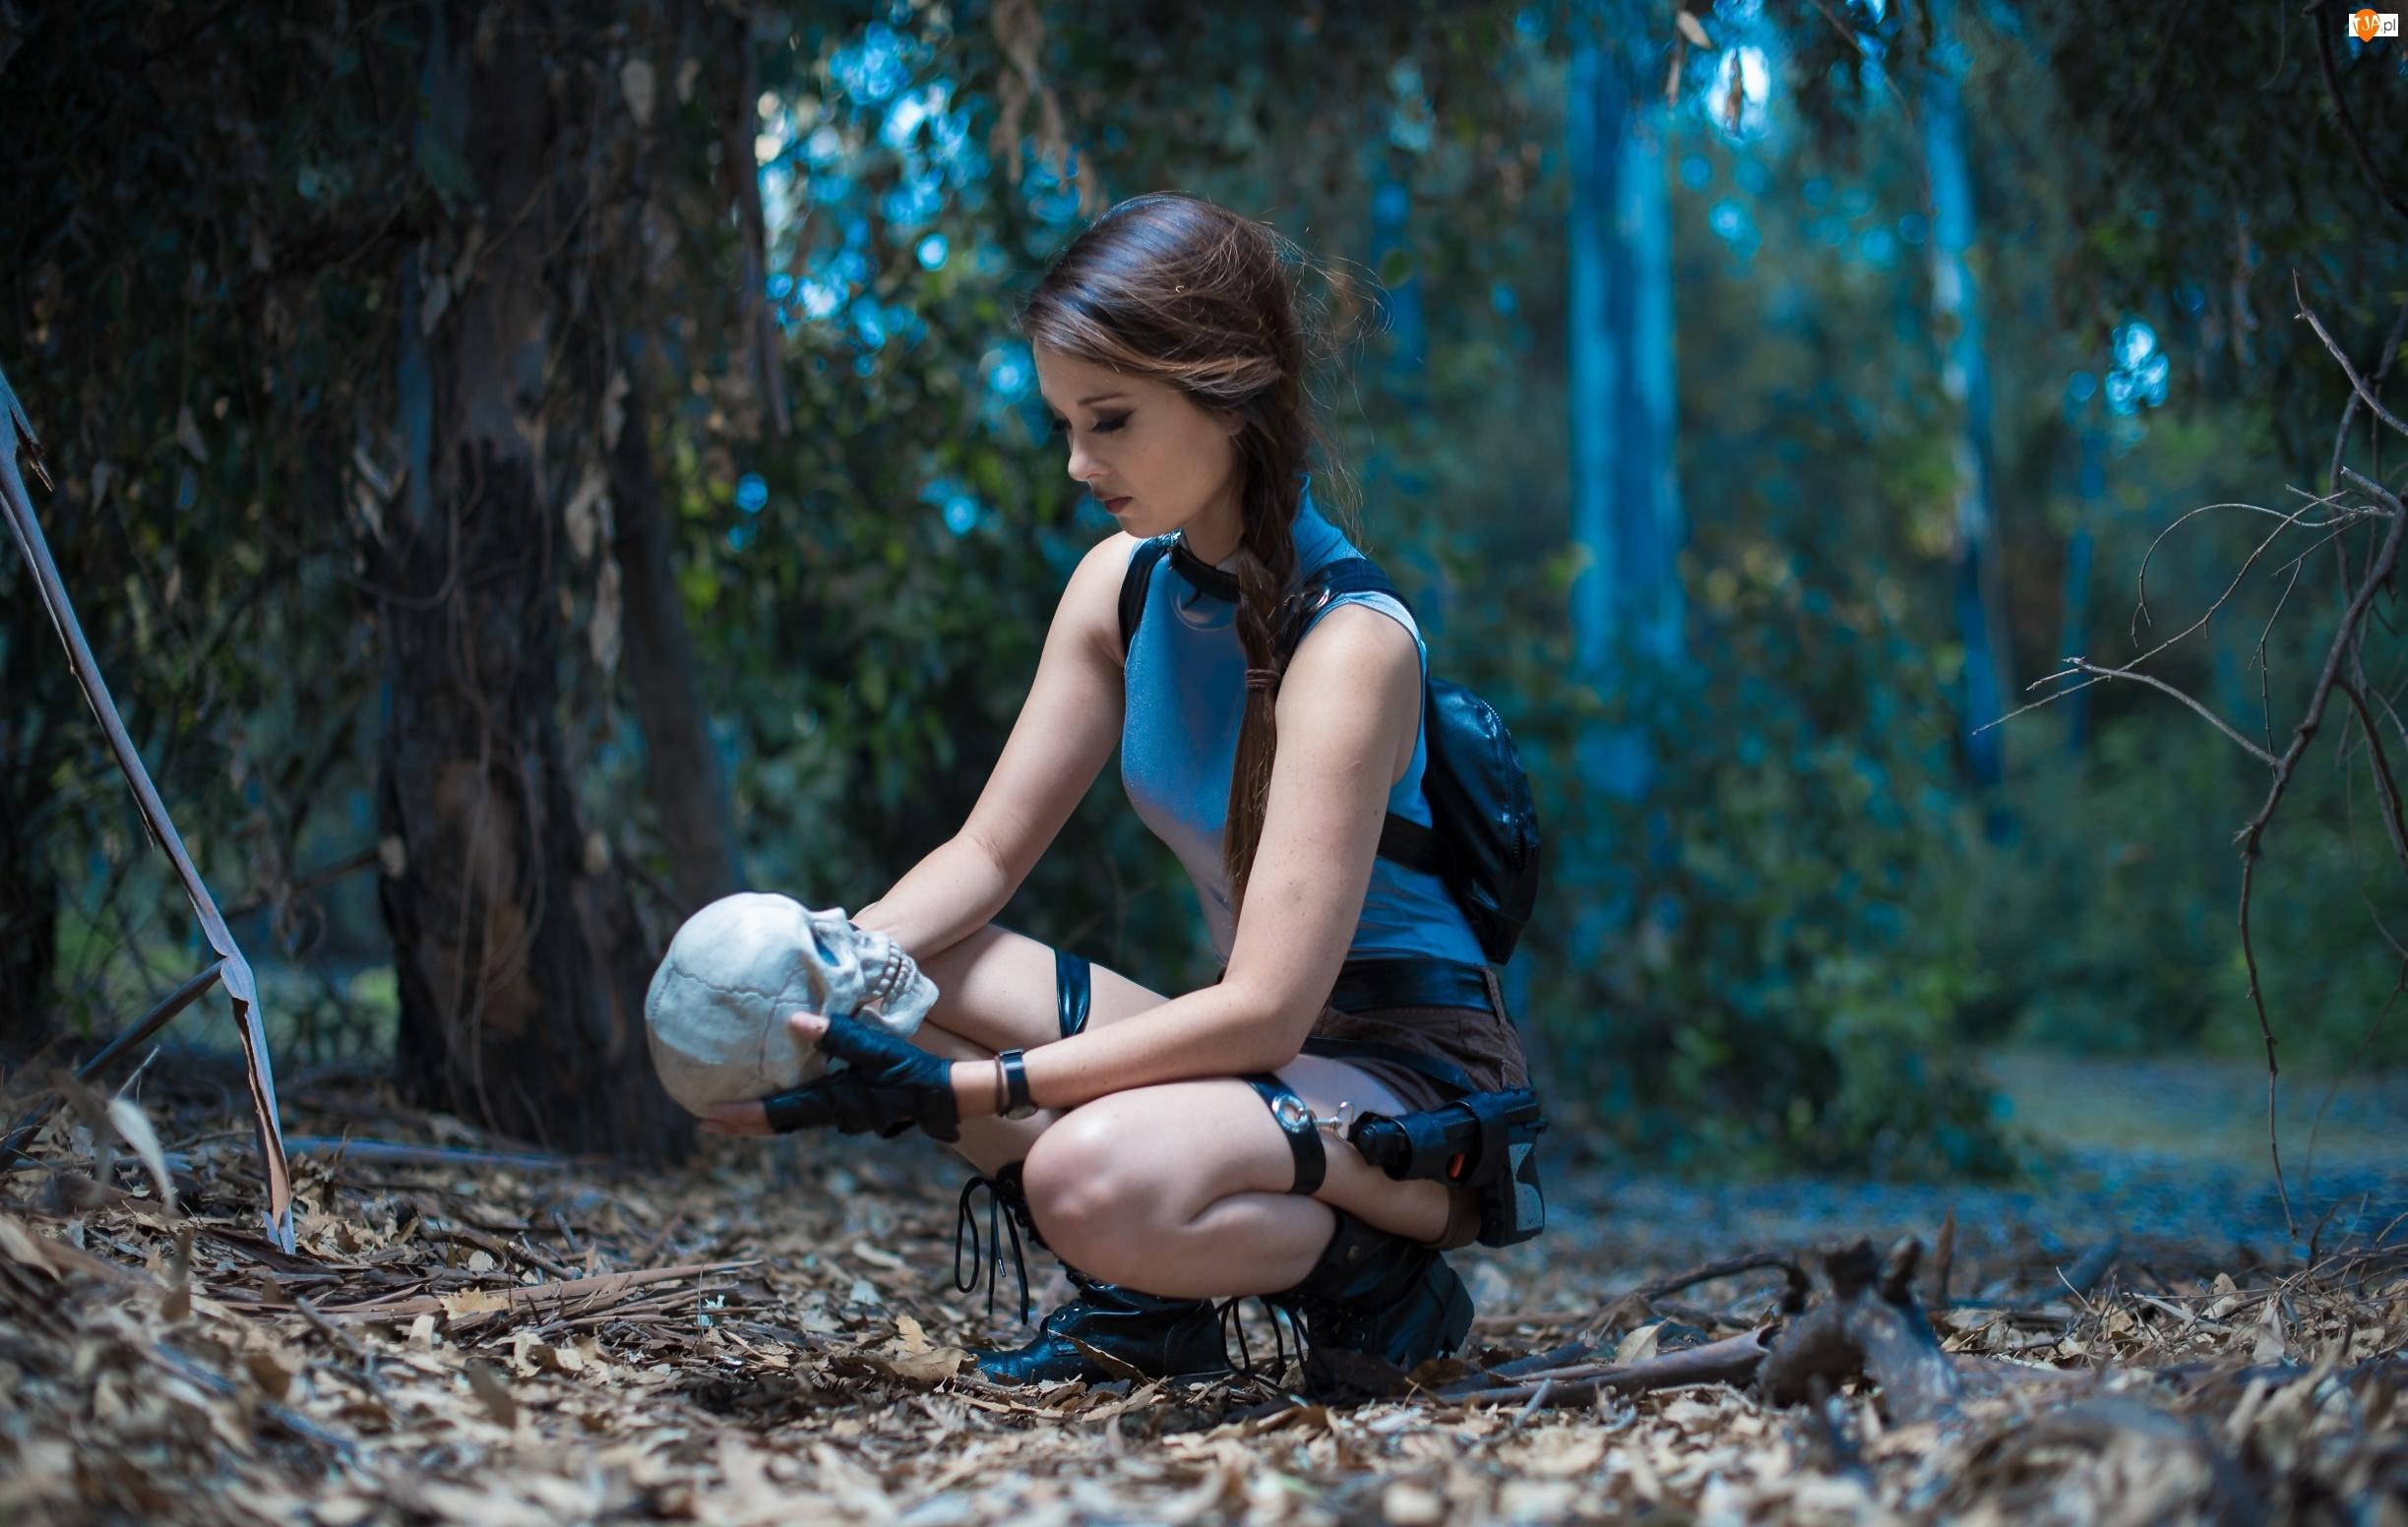 Kobieta, Lara Croft, Czaszka